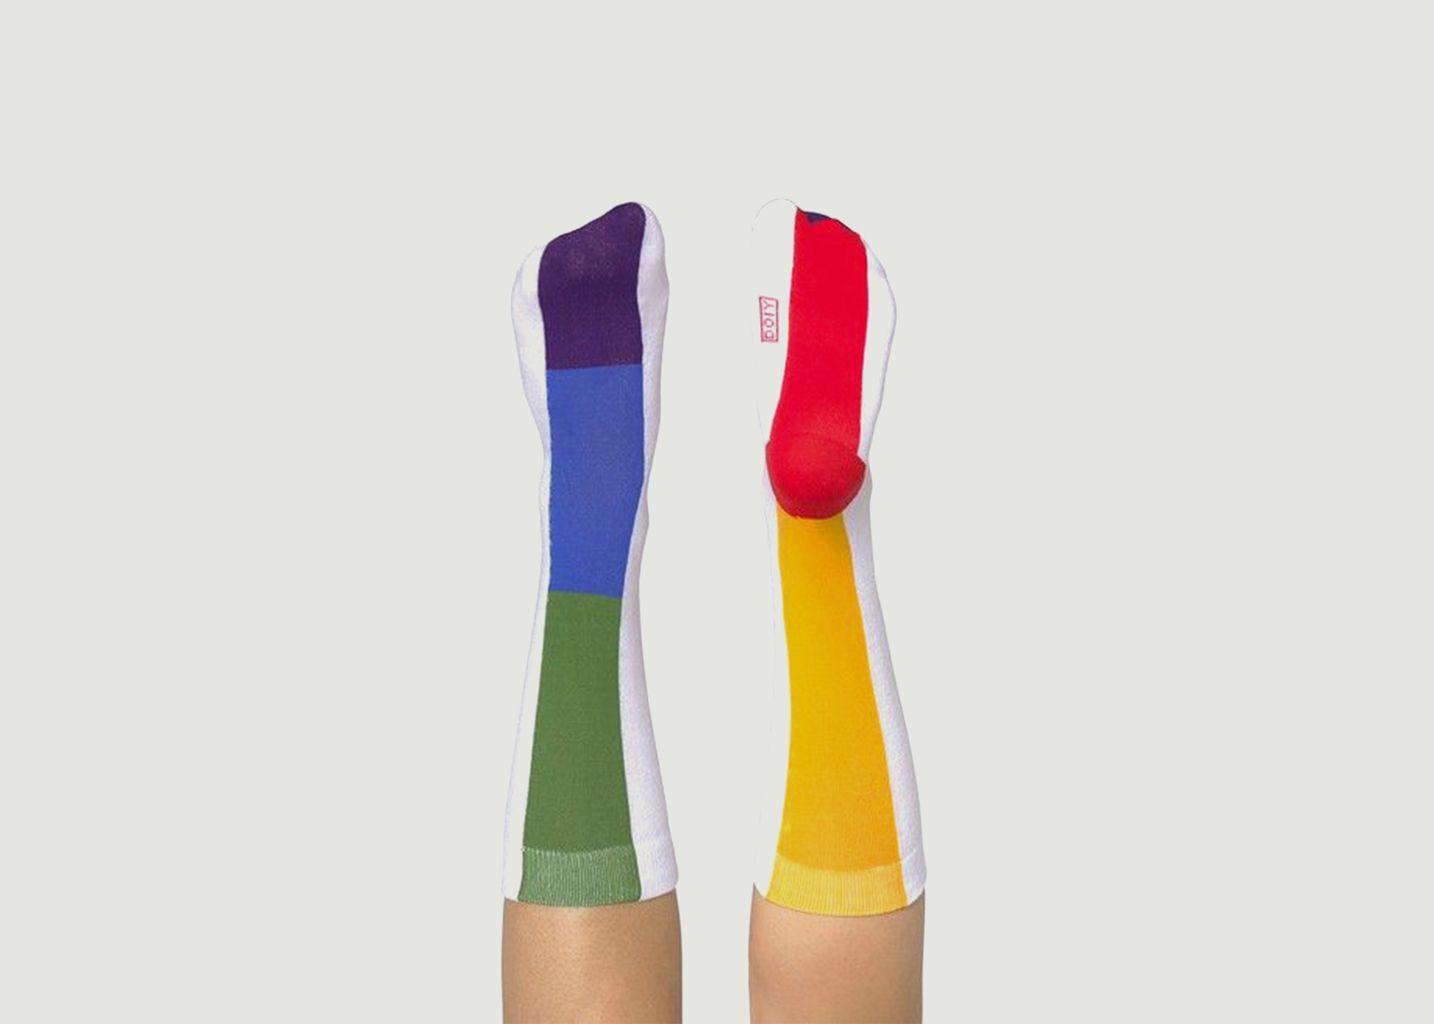 Chaussettes multicolores Rainbow - Doiy